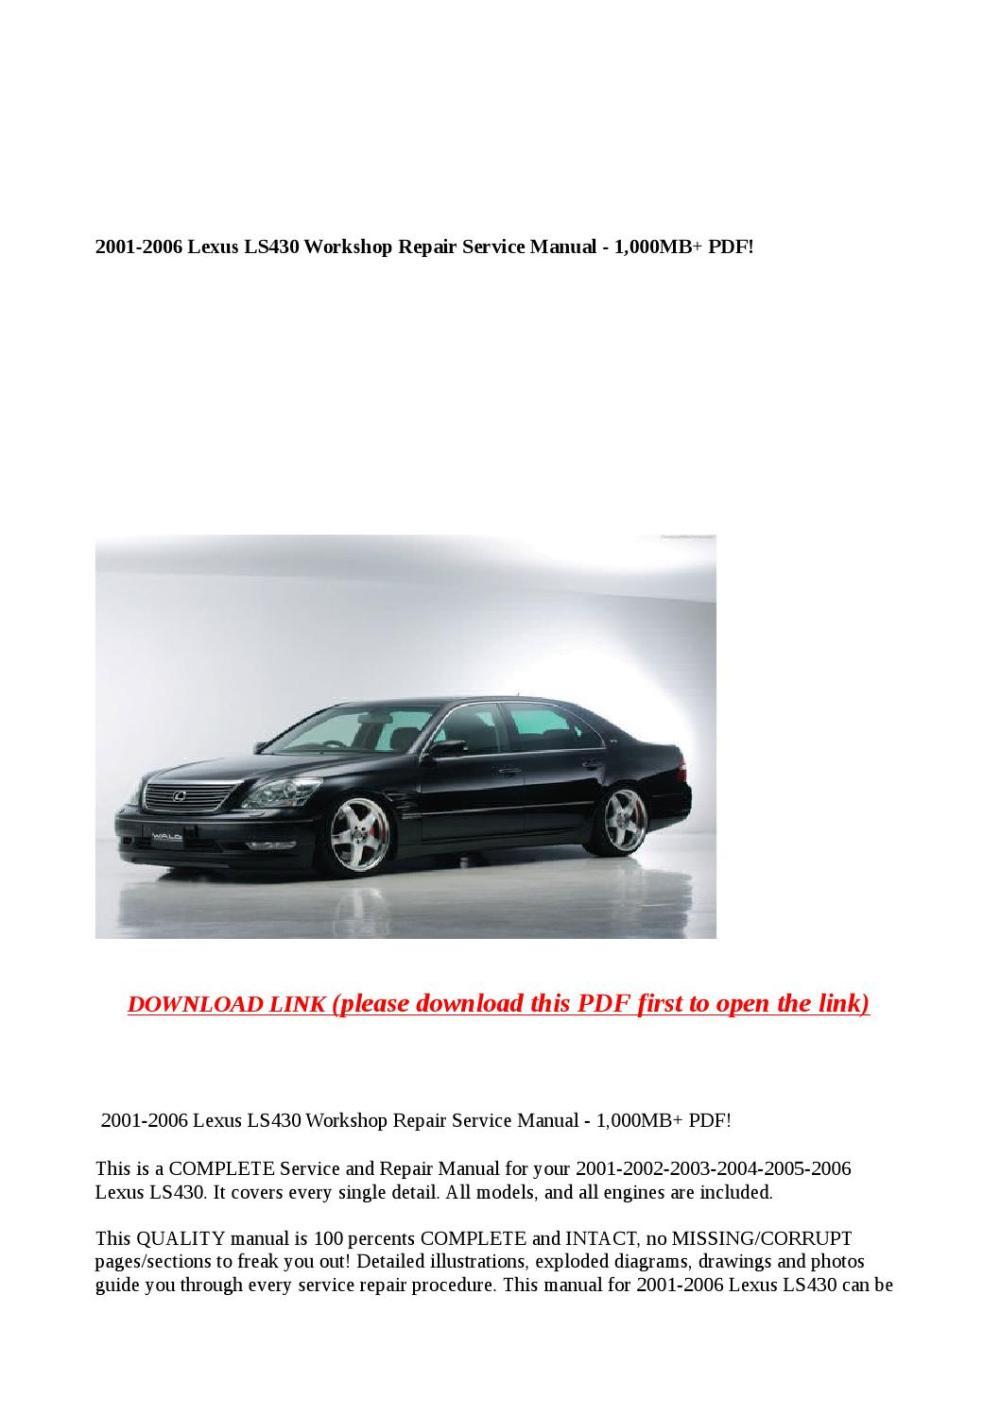 medium resolution of 2001 2006 lexus ls430 workshop repair service manual 1 000mb pdf